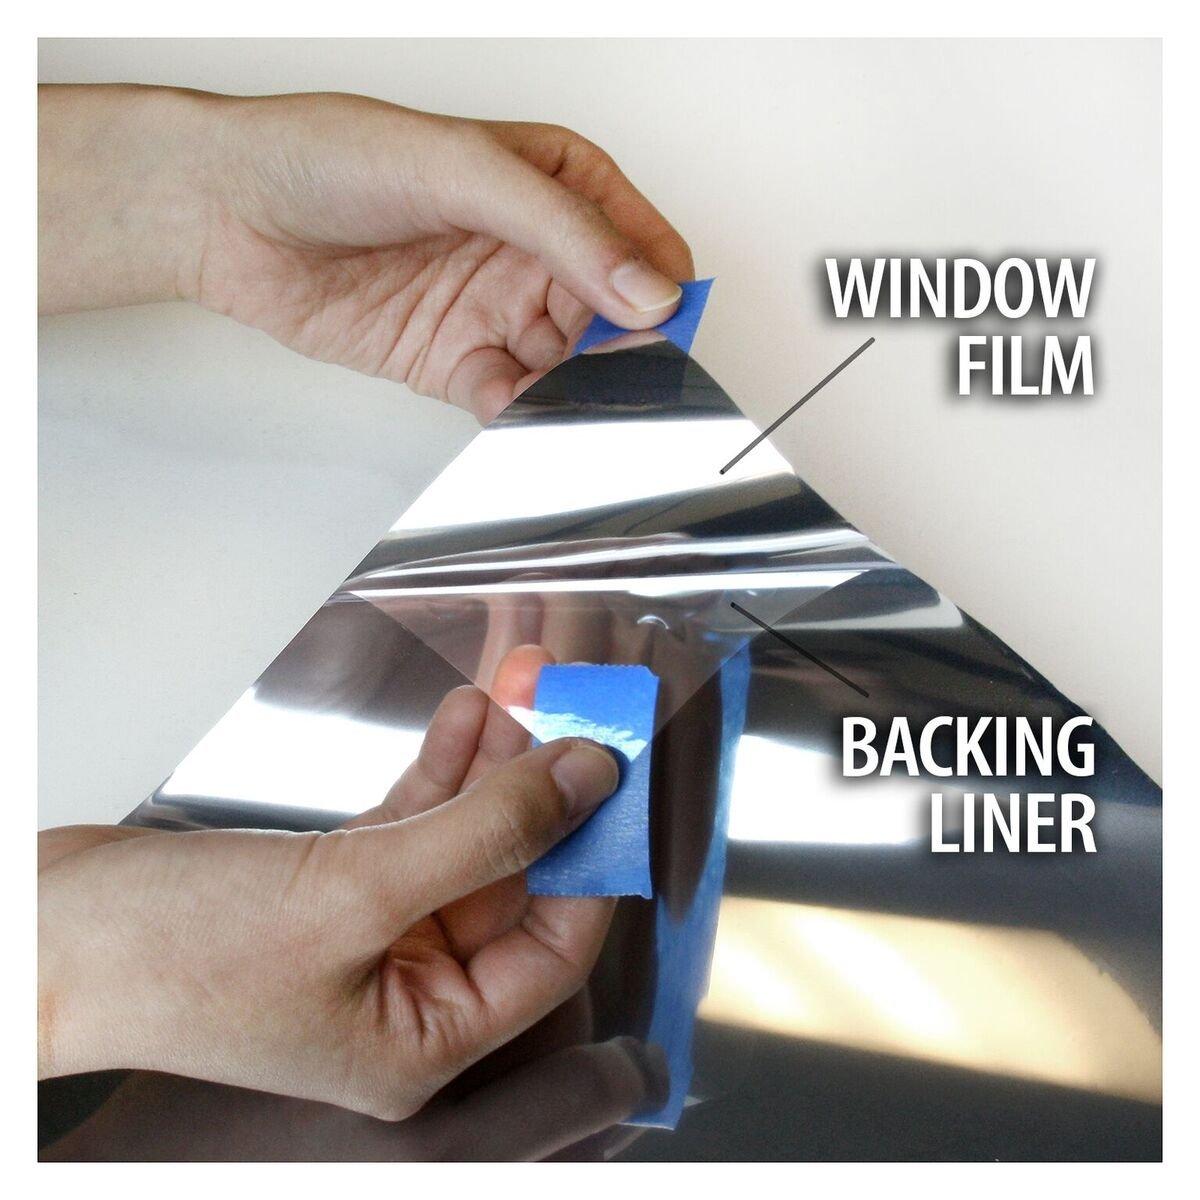 BDF S15 Window Film One Way Mirror Silver 15 (Dark) - 48in X 100ft by Buydecorativefilm (Image #6)